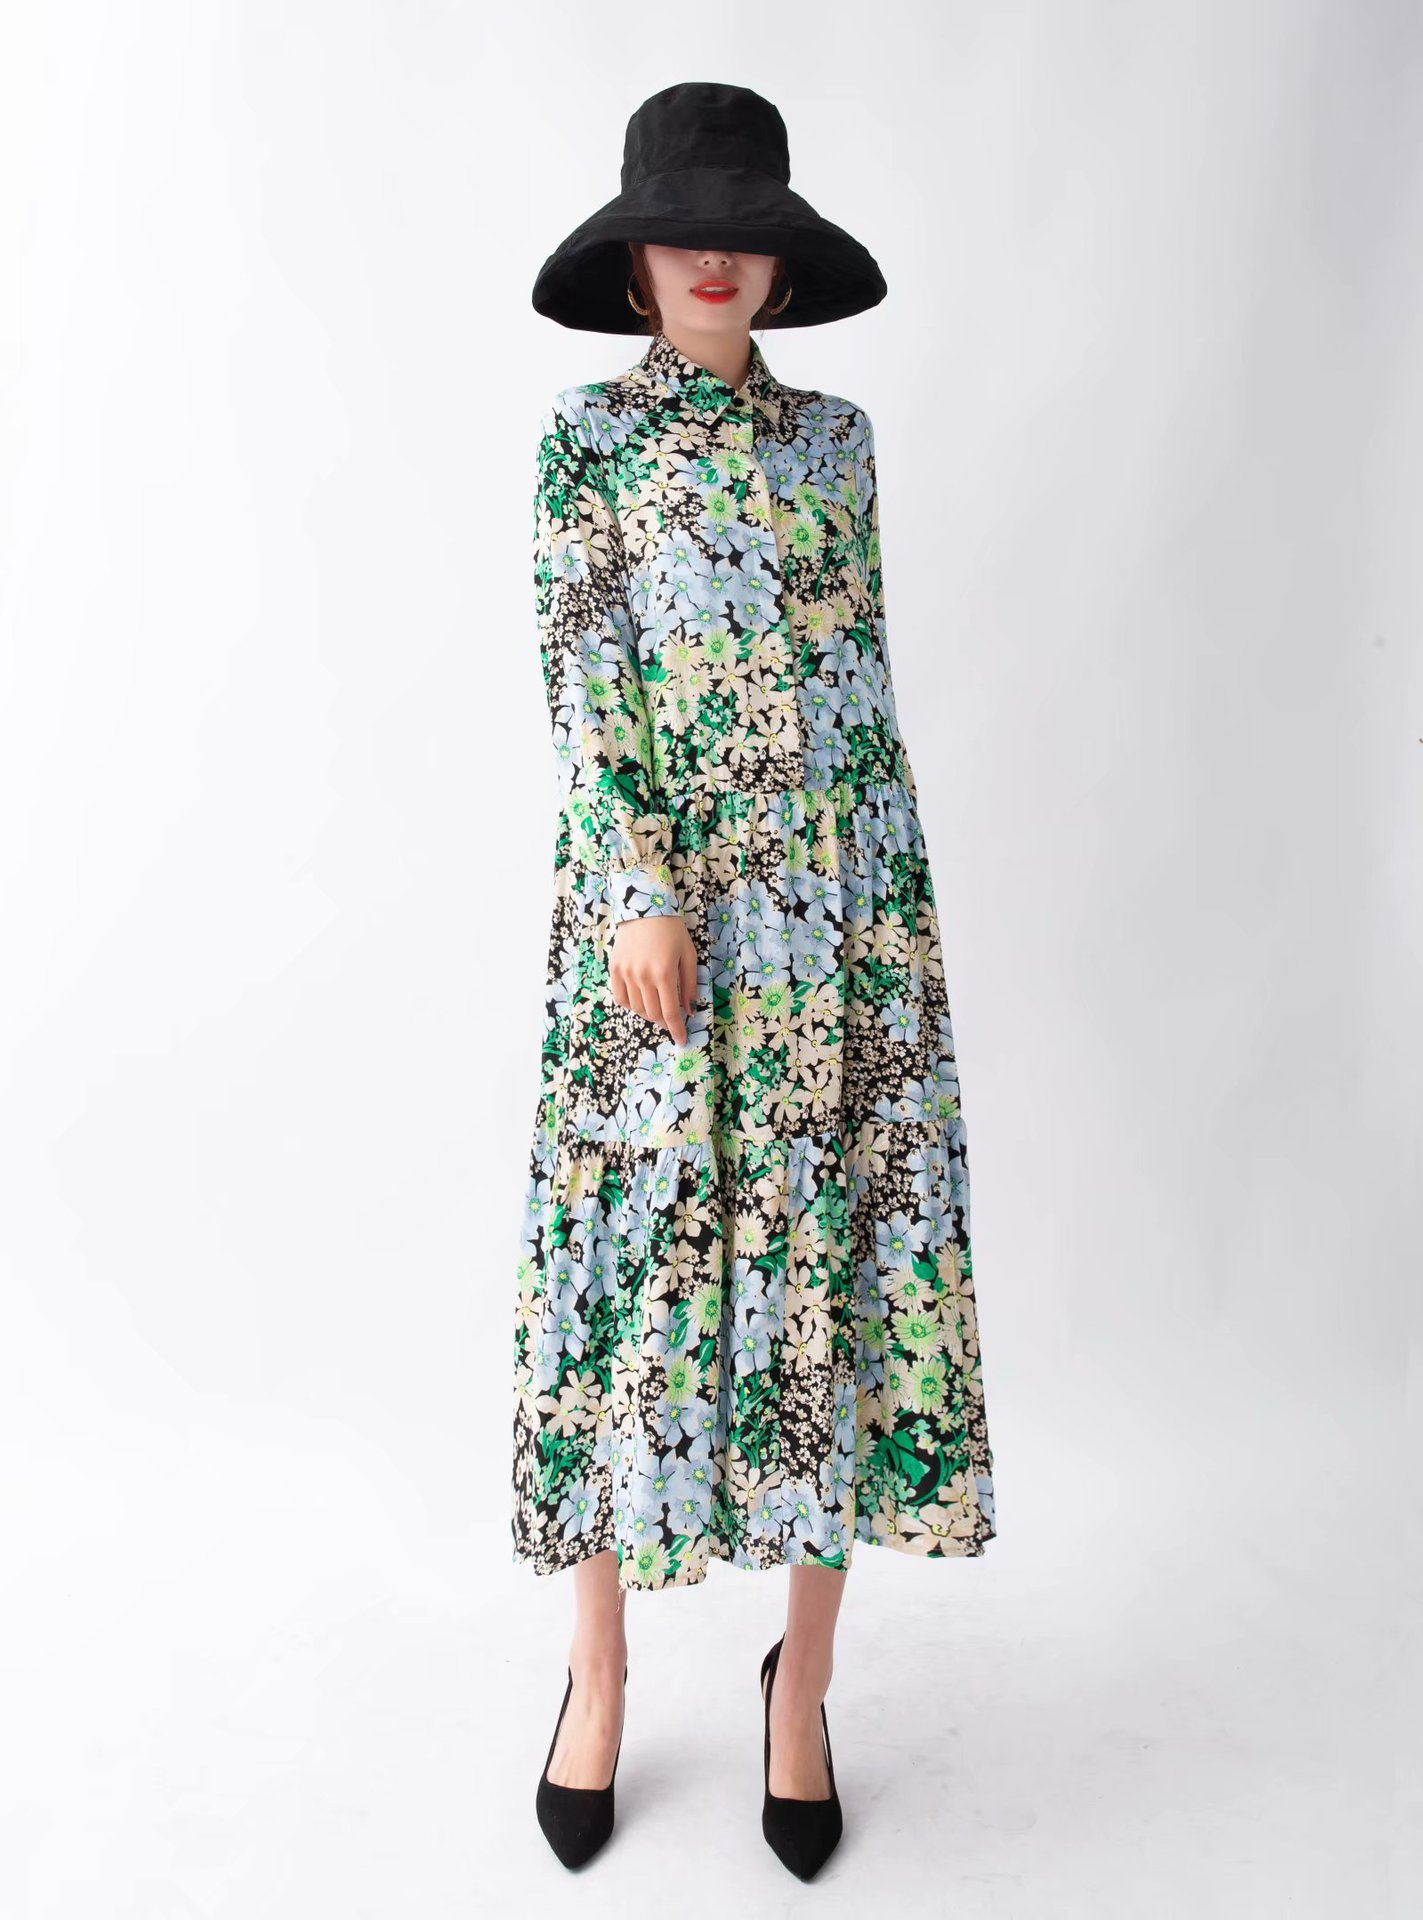 2020 New Spring Summer New Style European Collared Floral Printed Dress Zaraing Vadiming Sheining Women Female Dress